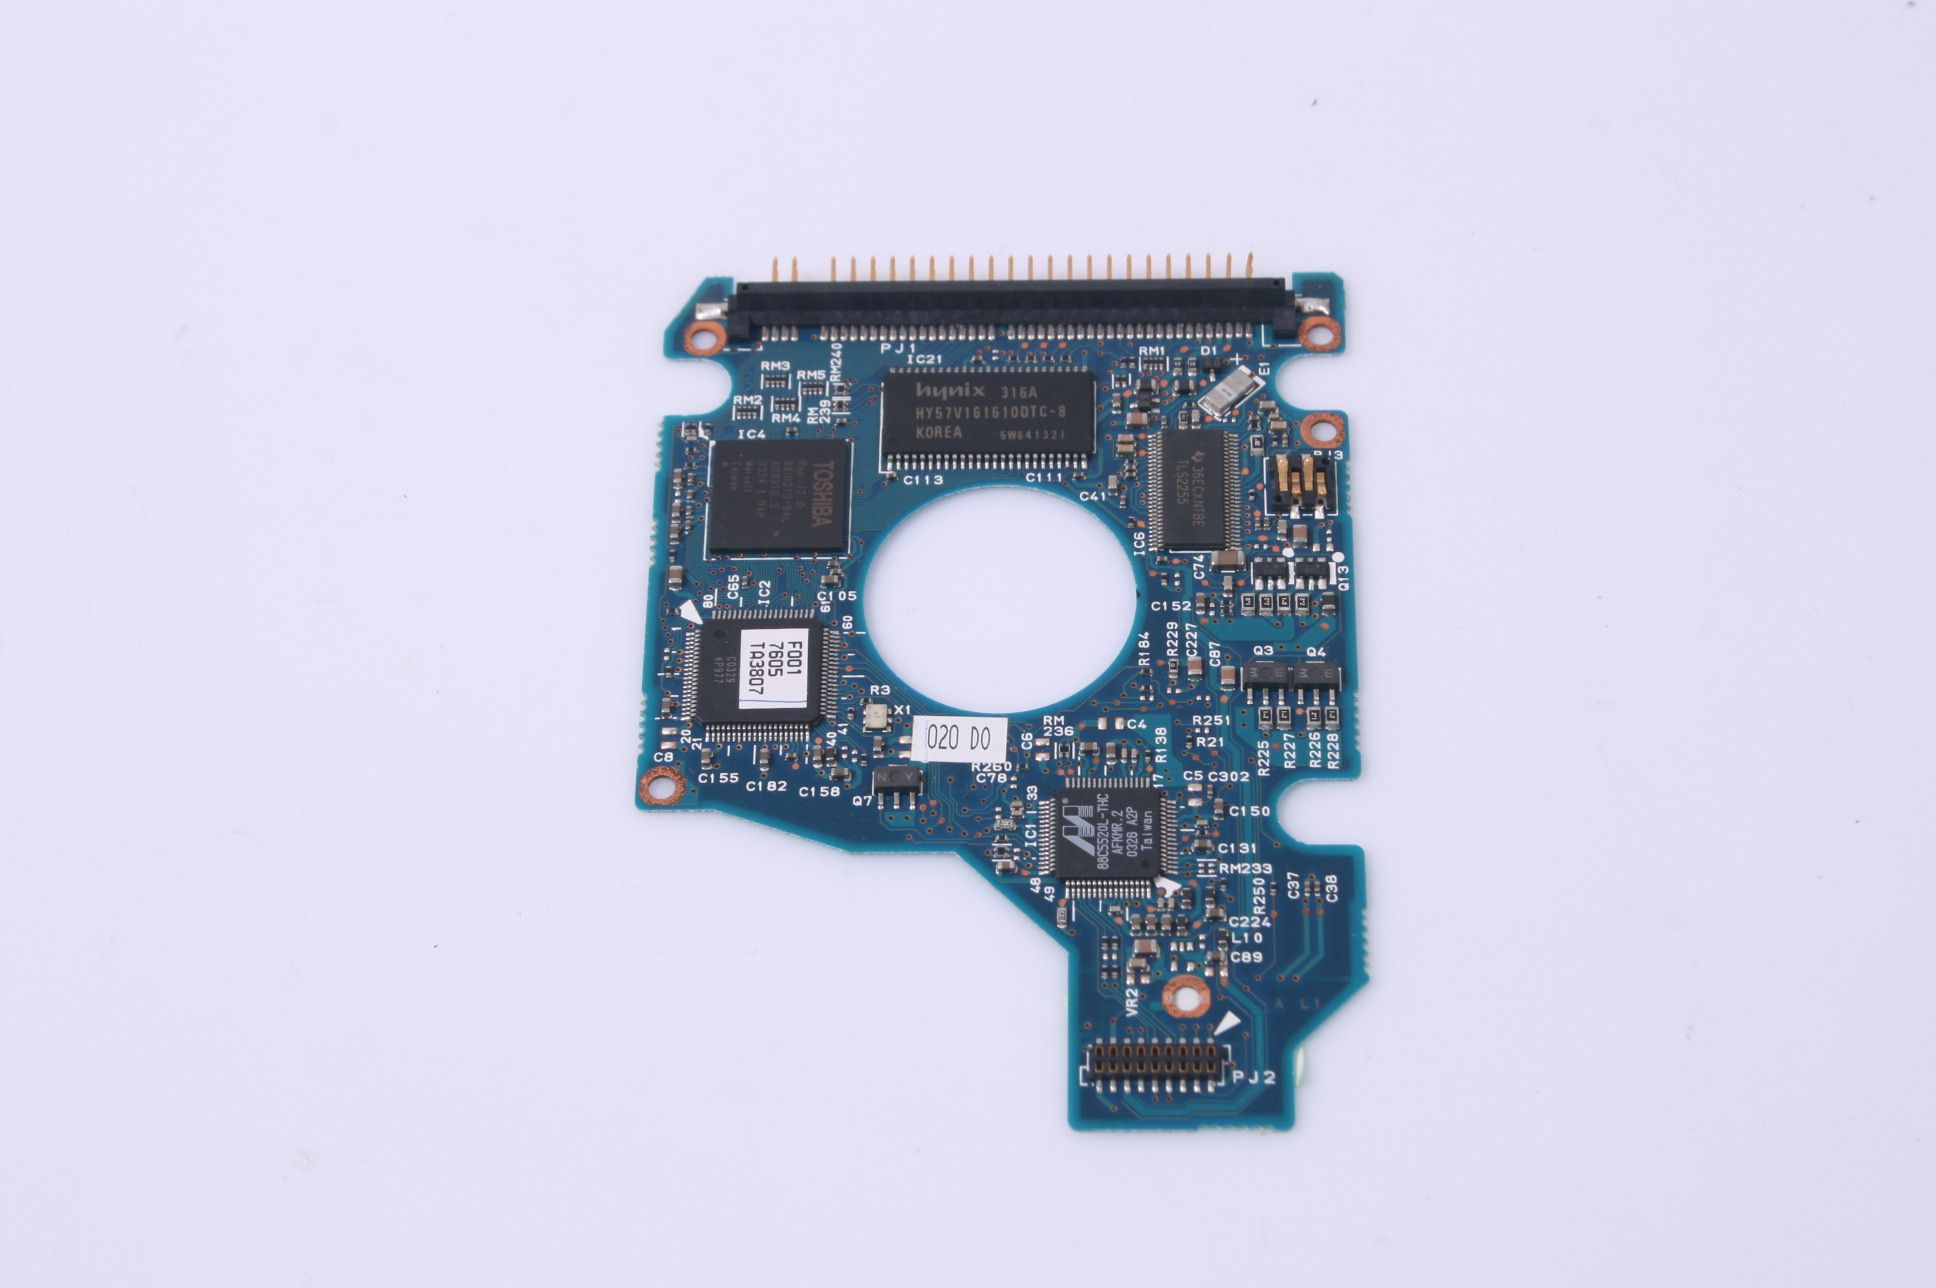 TOSHIBA MK3021GAS 30GB 2.5 IDE HARD DRIVE / PCB (CIRCUIT BOARD) ONLY FOR DA